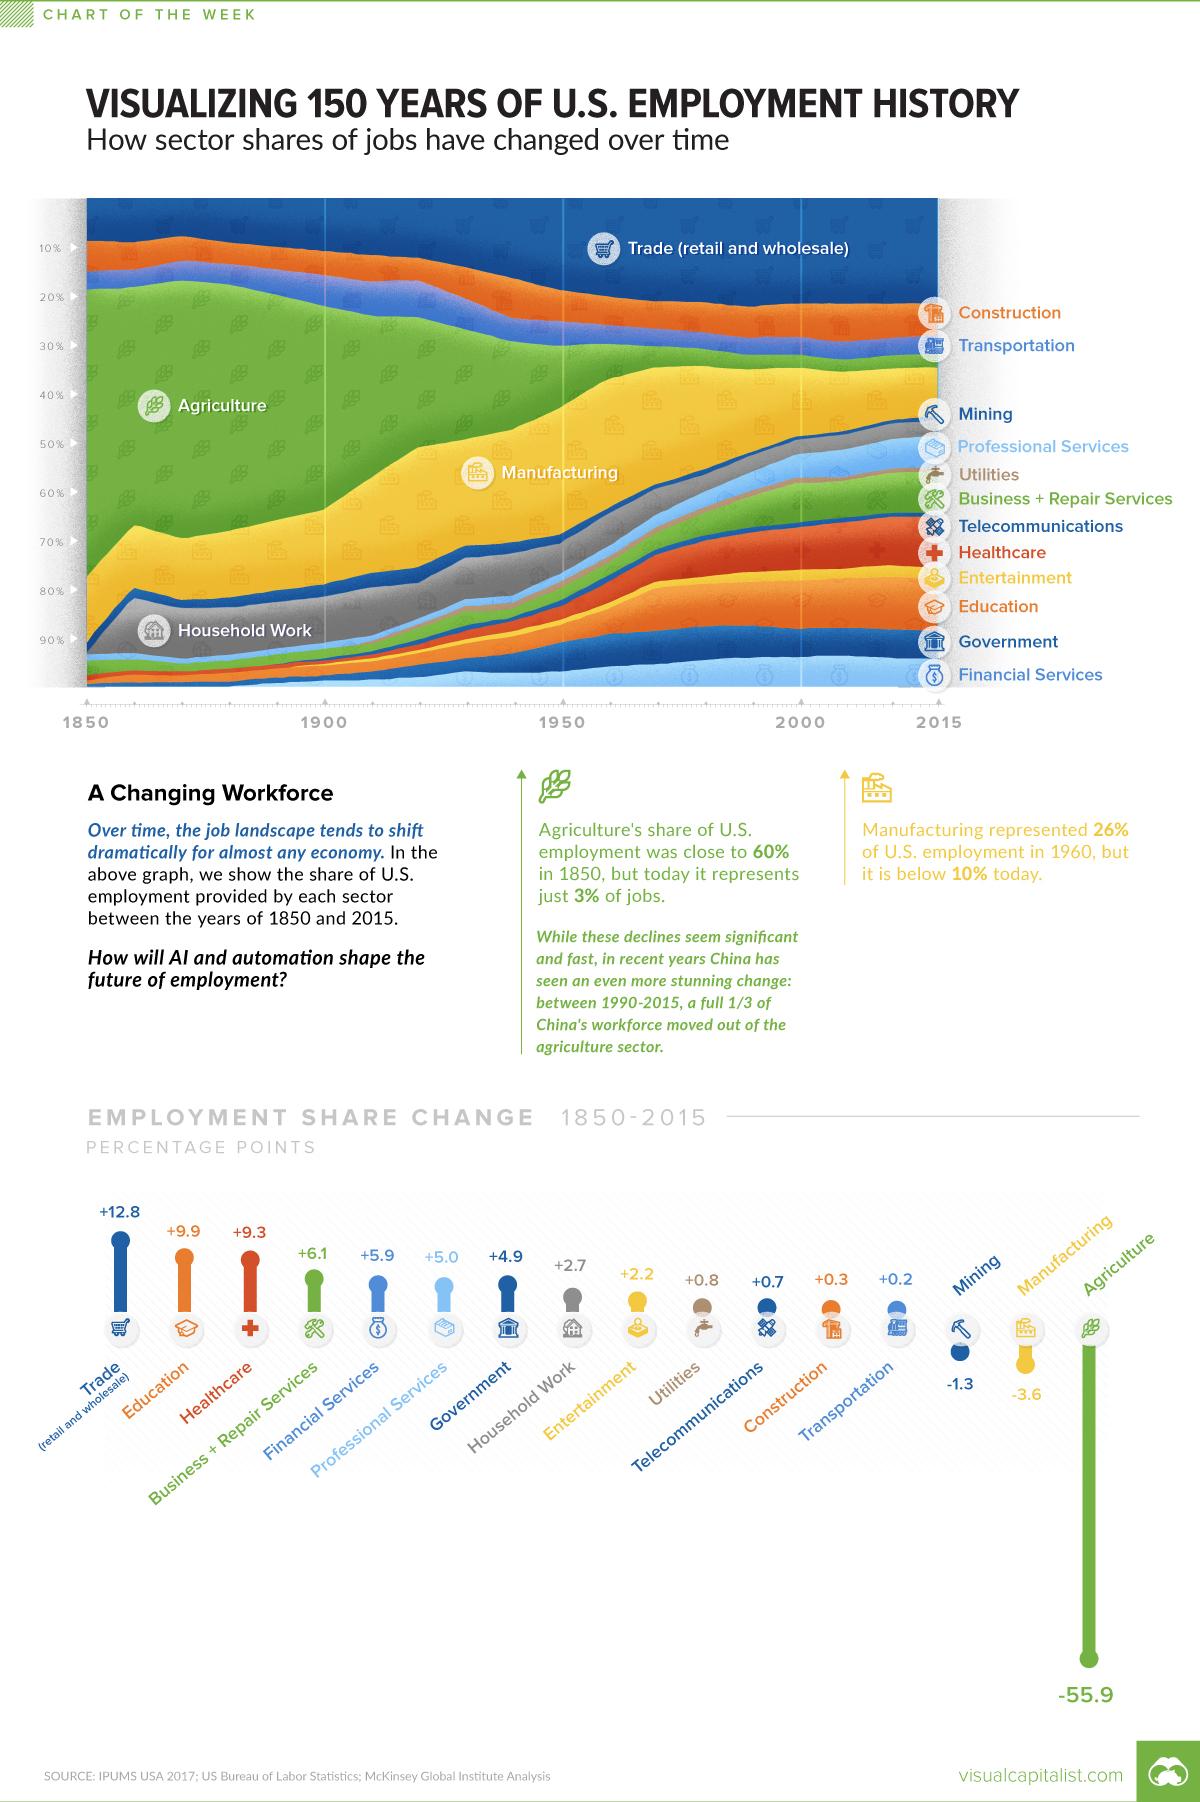 Visualizing 150 Years of U.S. Employment History